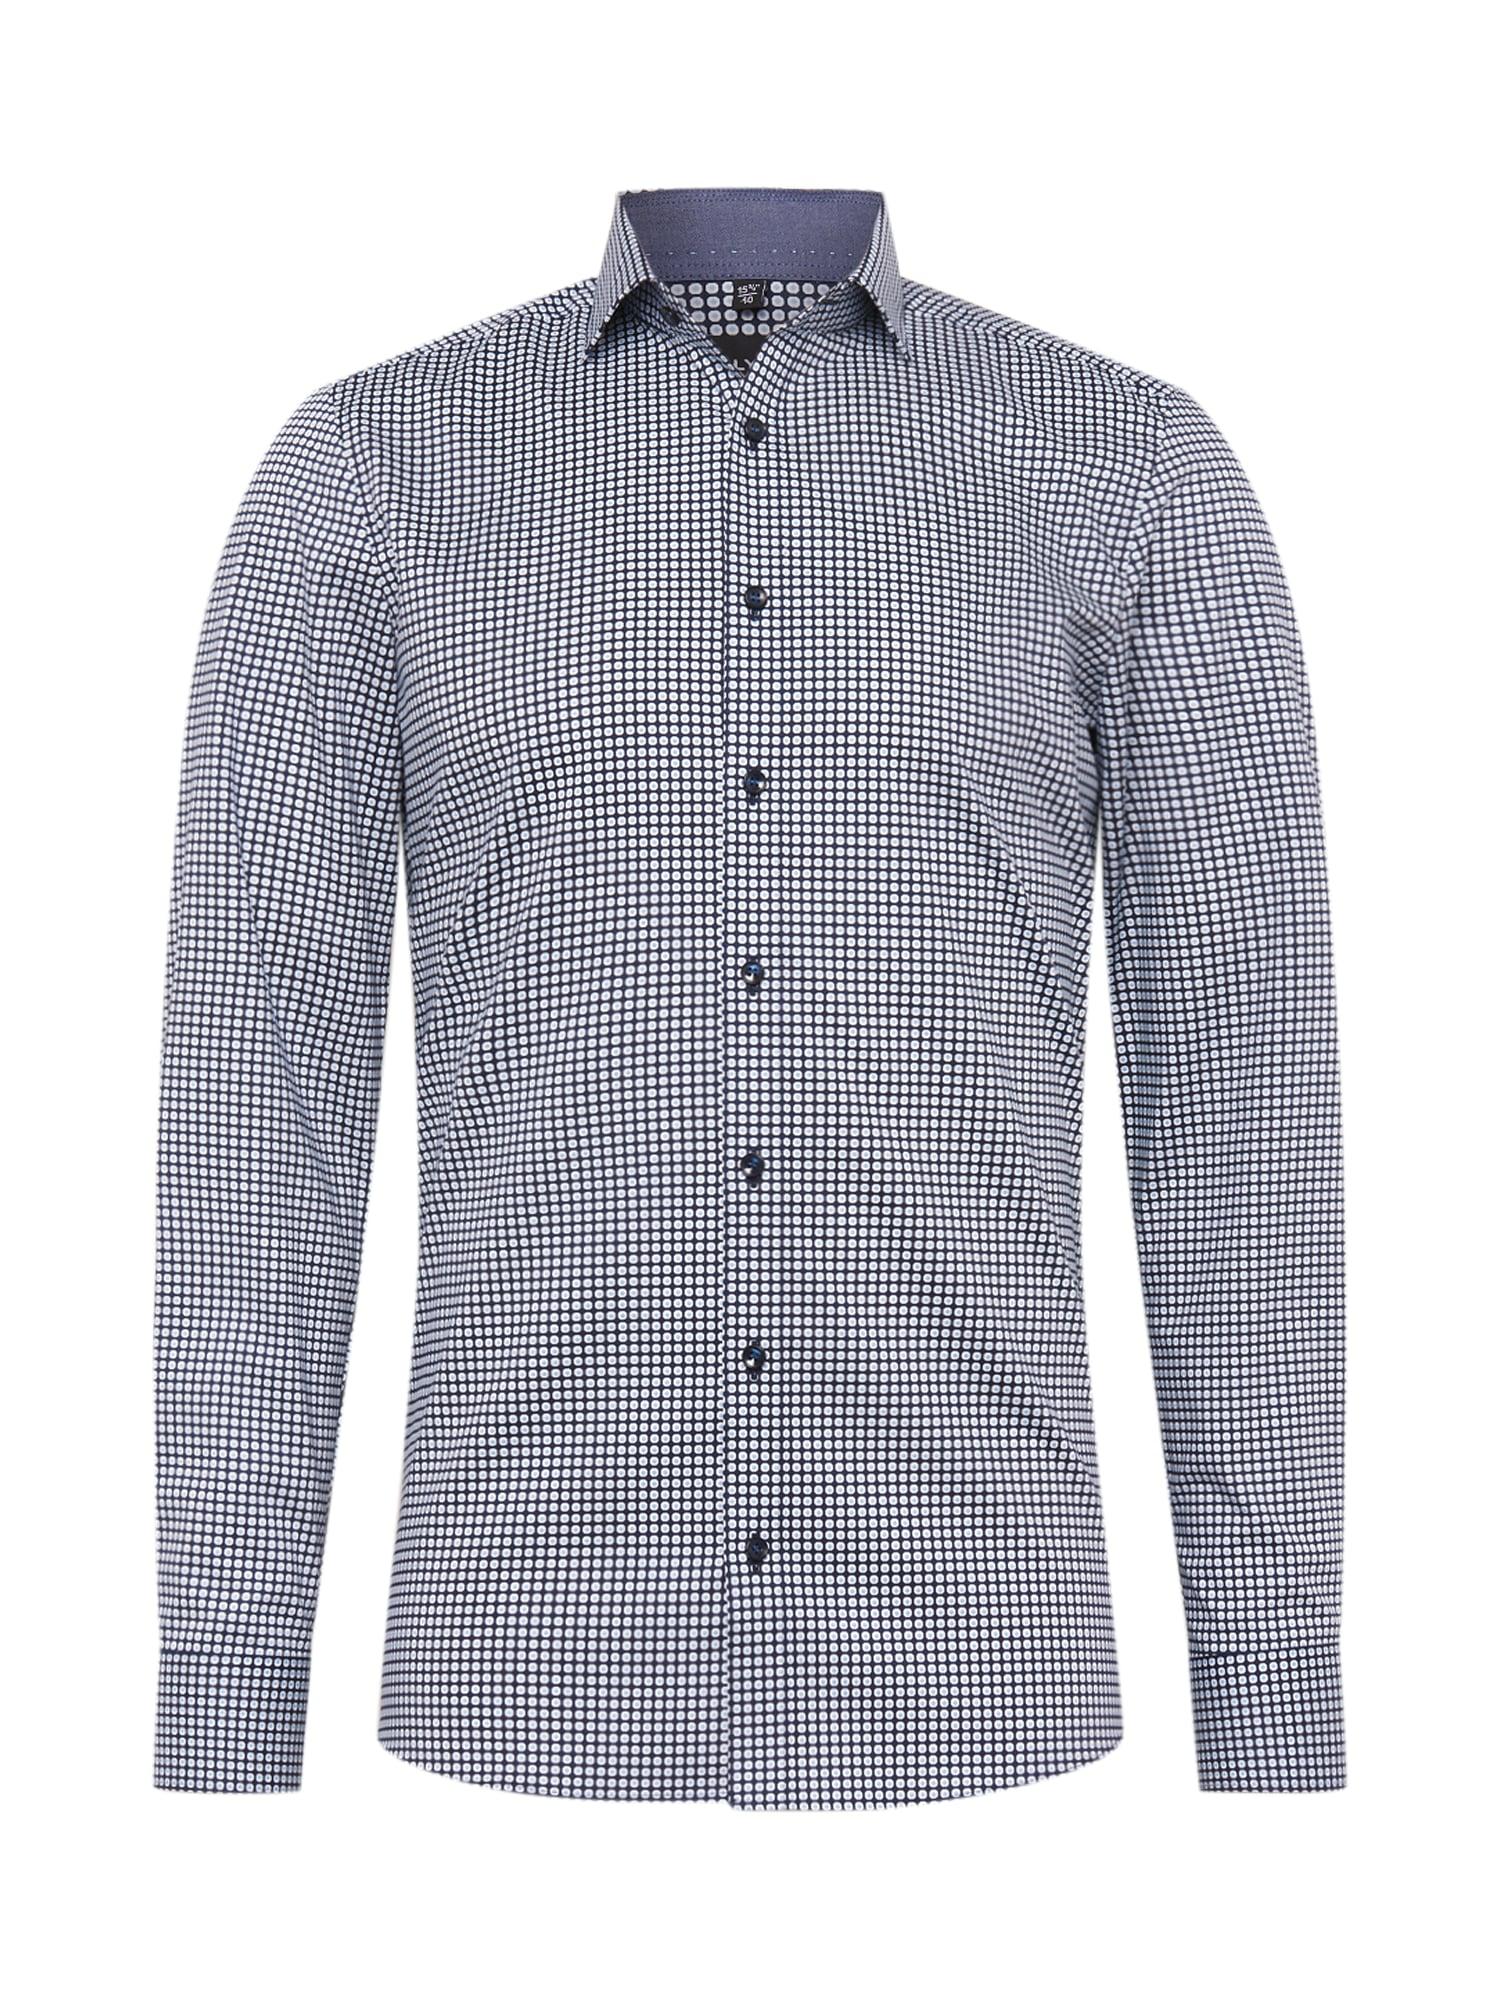 OLYMP Marškiniai mėlyna / balta